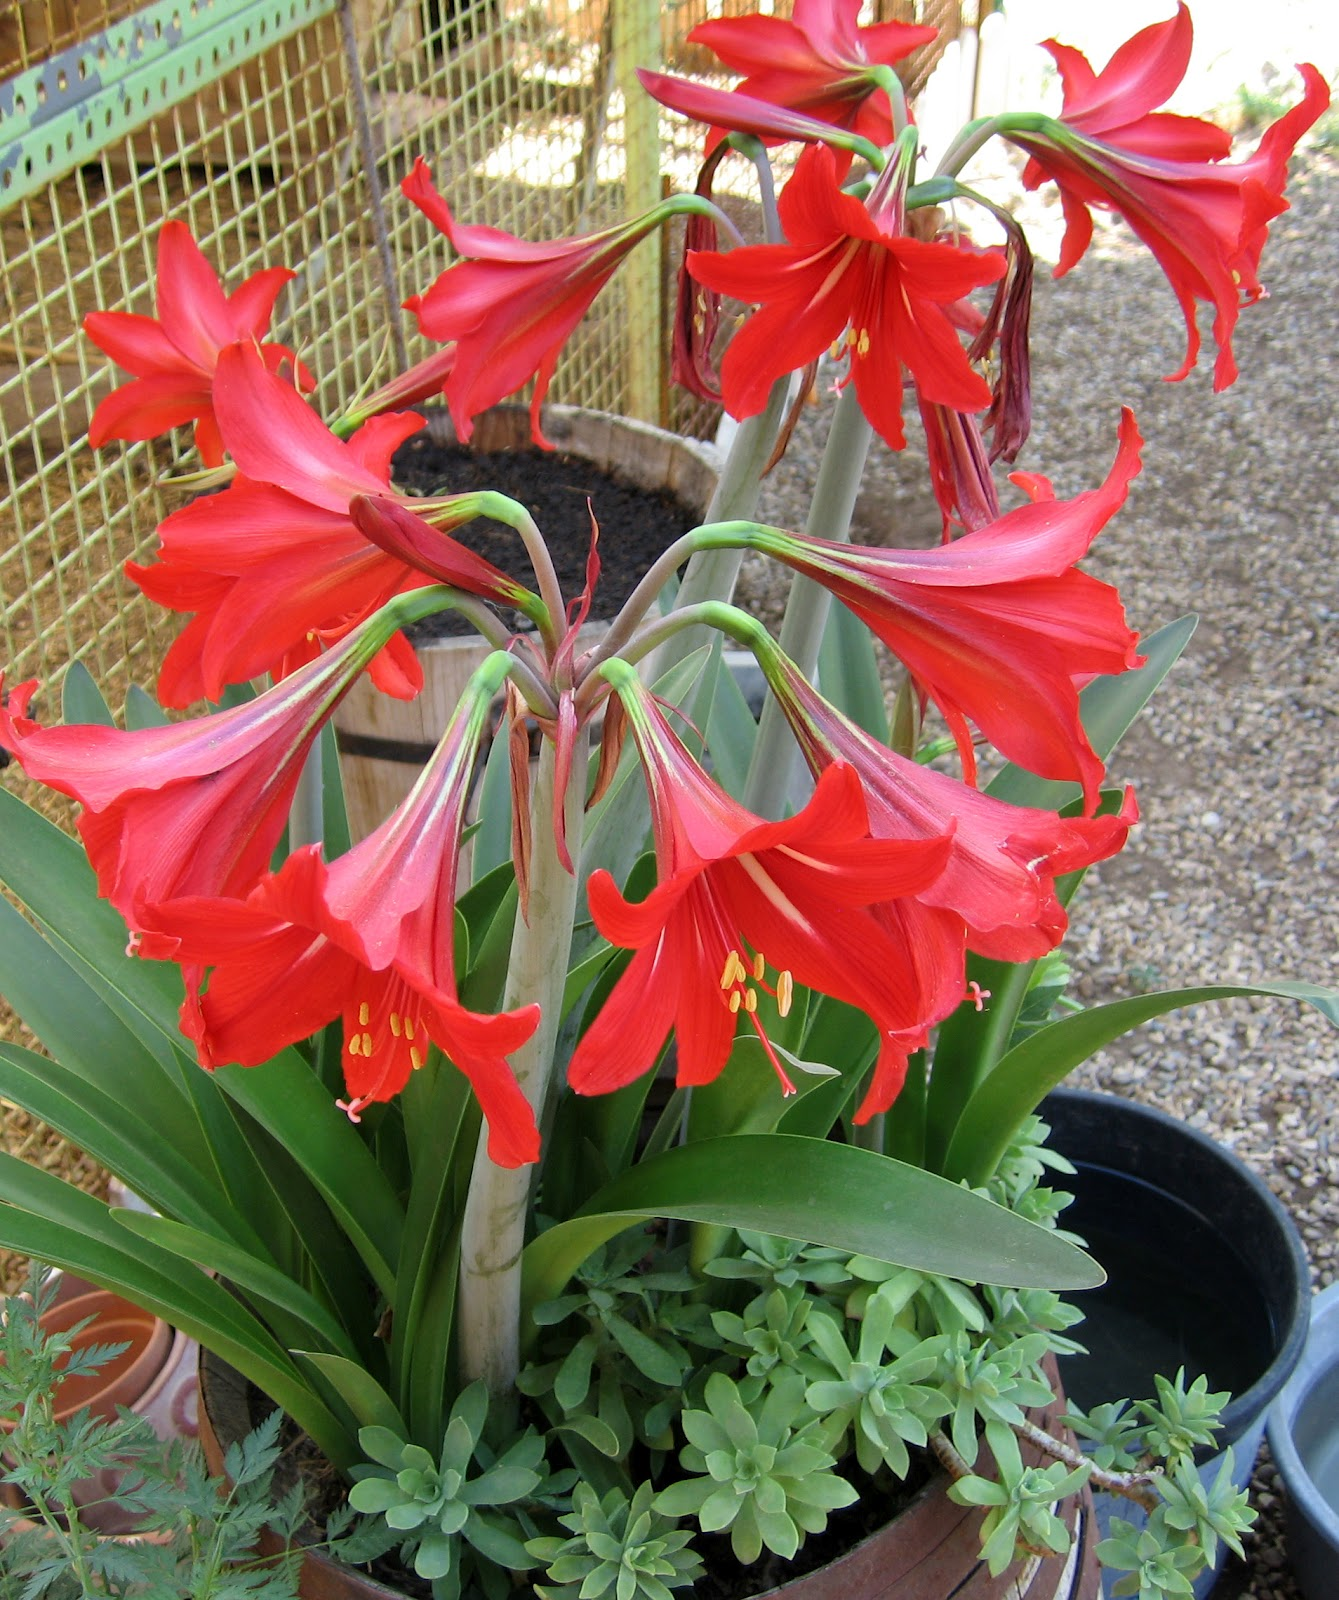 Fotos De Flores De Todo Tipo - Nombres de flores con fotos Plantas facilisimo com